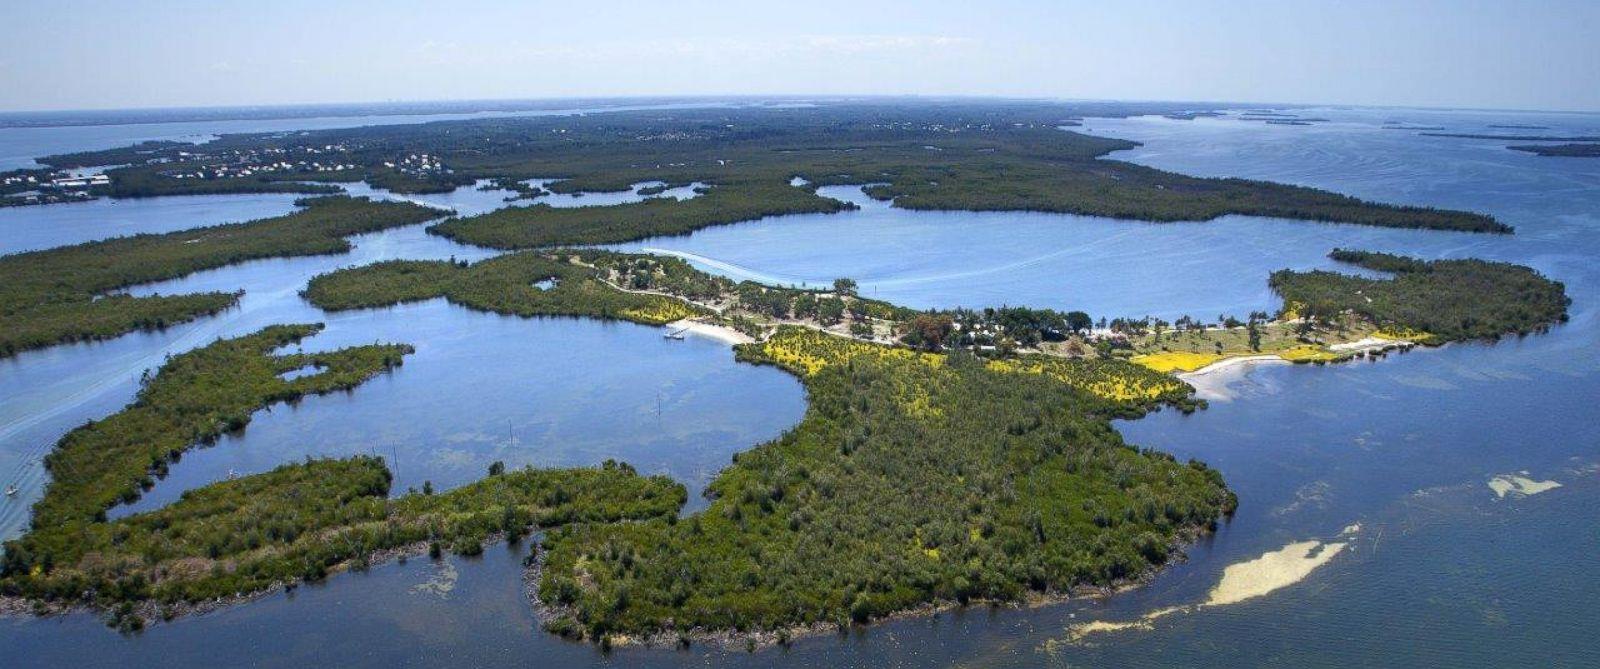 Twitchell Island Florida